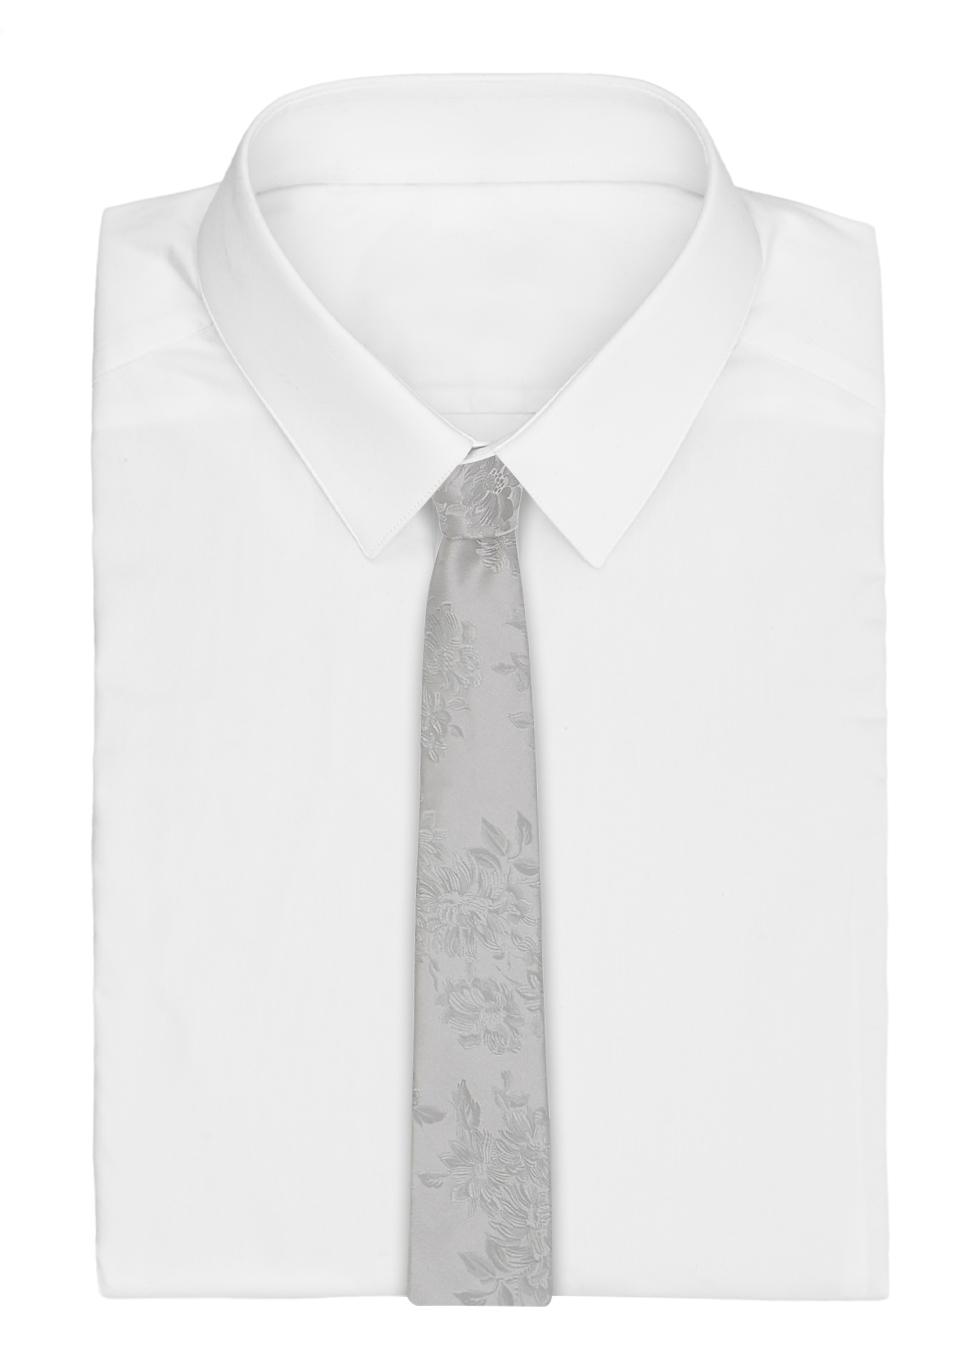 fab9ec72c0b6 Men's Designer Ties and Bow Ties - Harvey Nichols